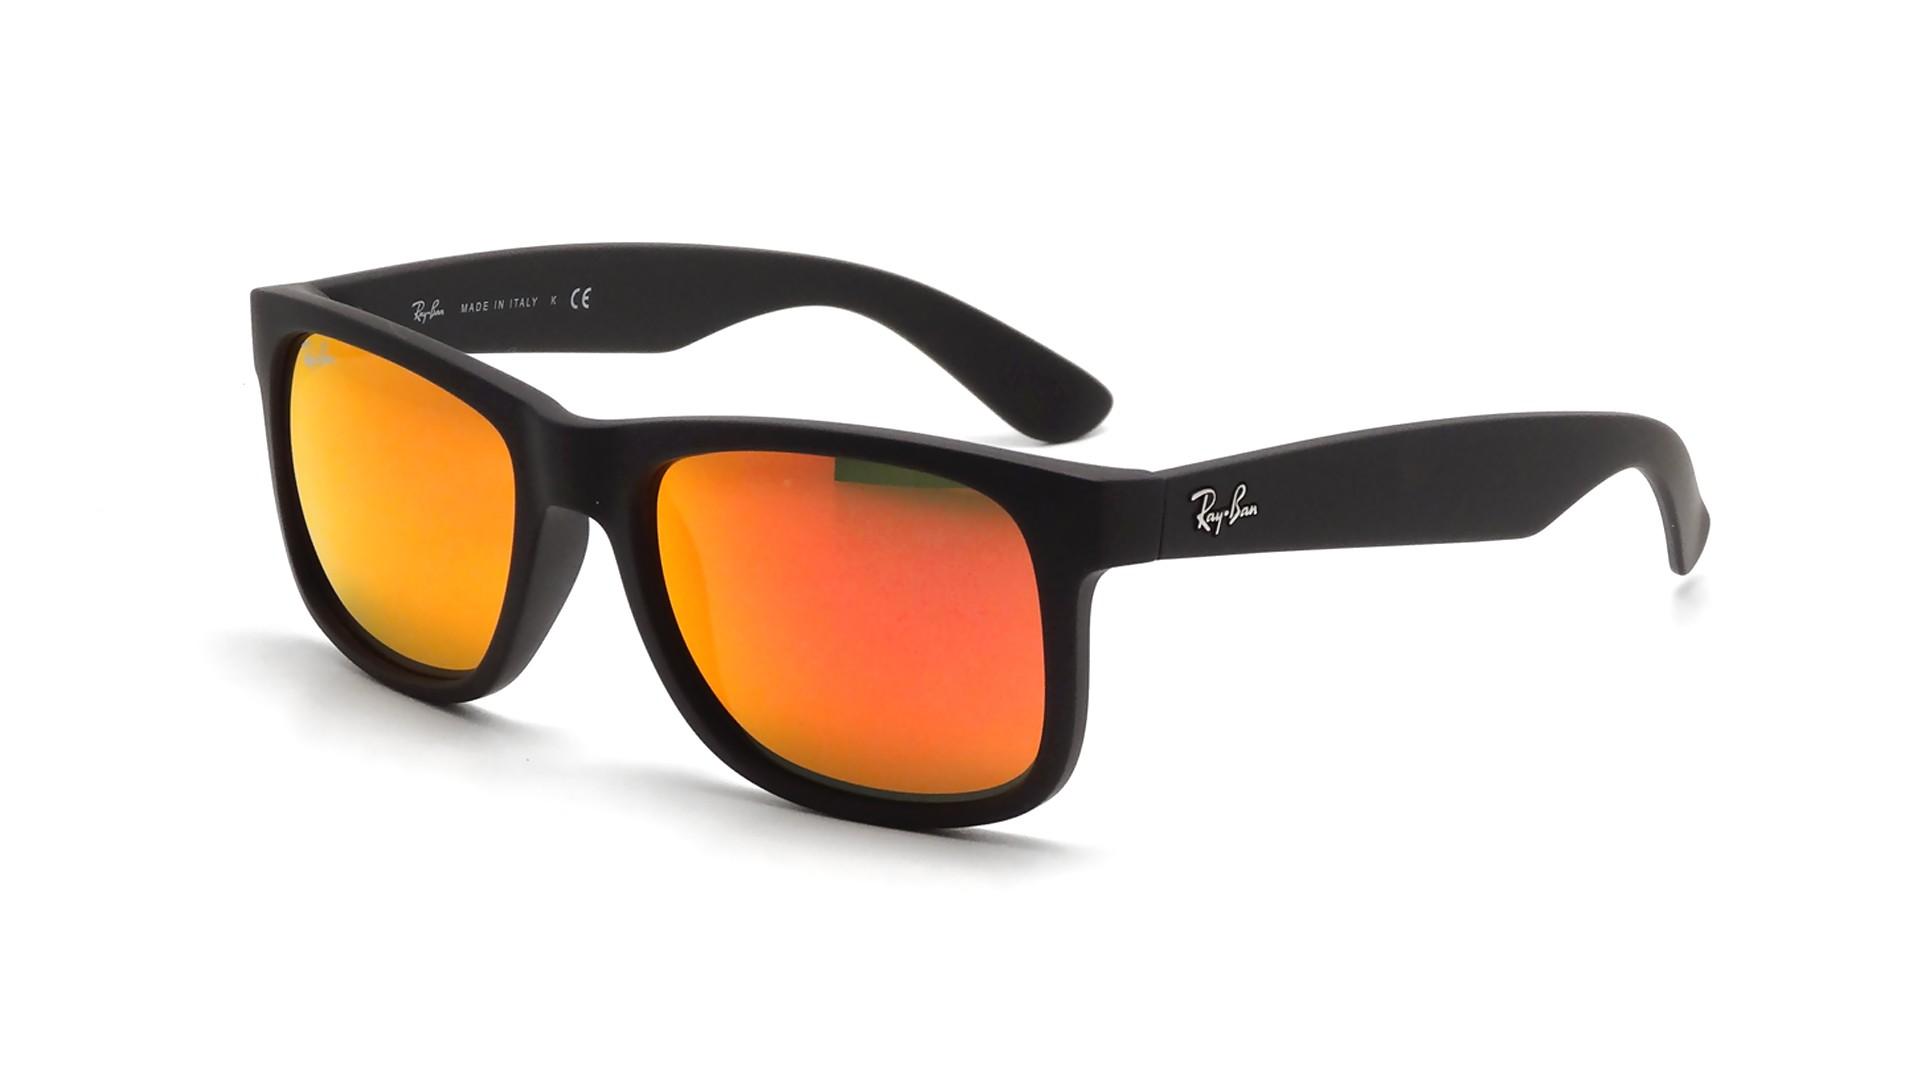 eca35985bf Ray Ban Justin Sunglasses Purple Frame Grey Lens « Heritage Malta